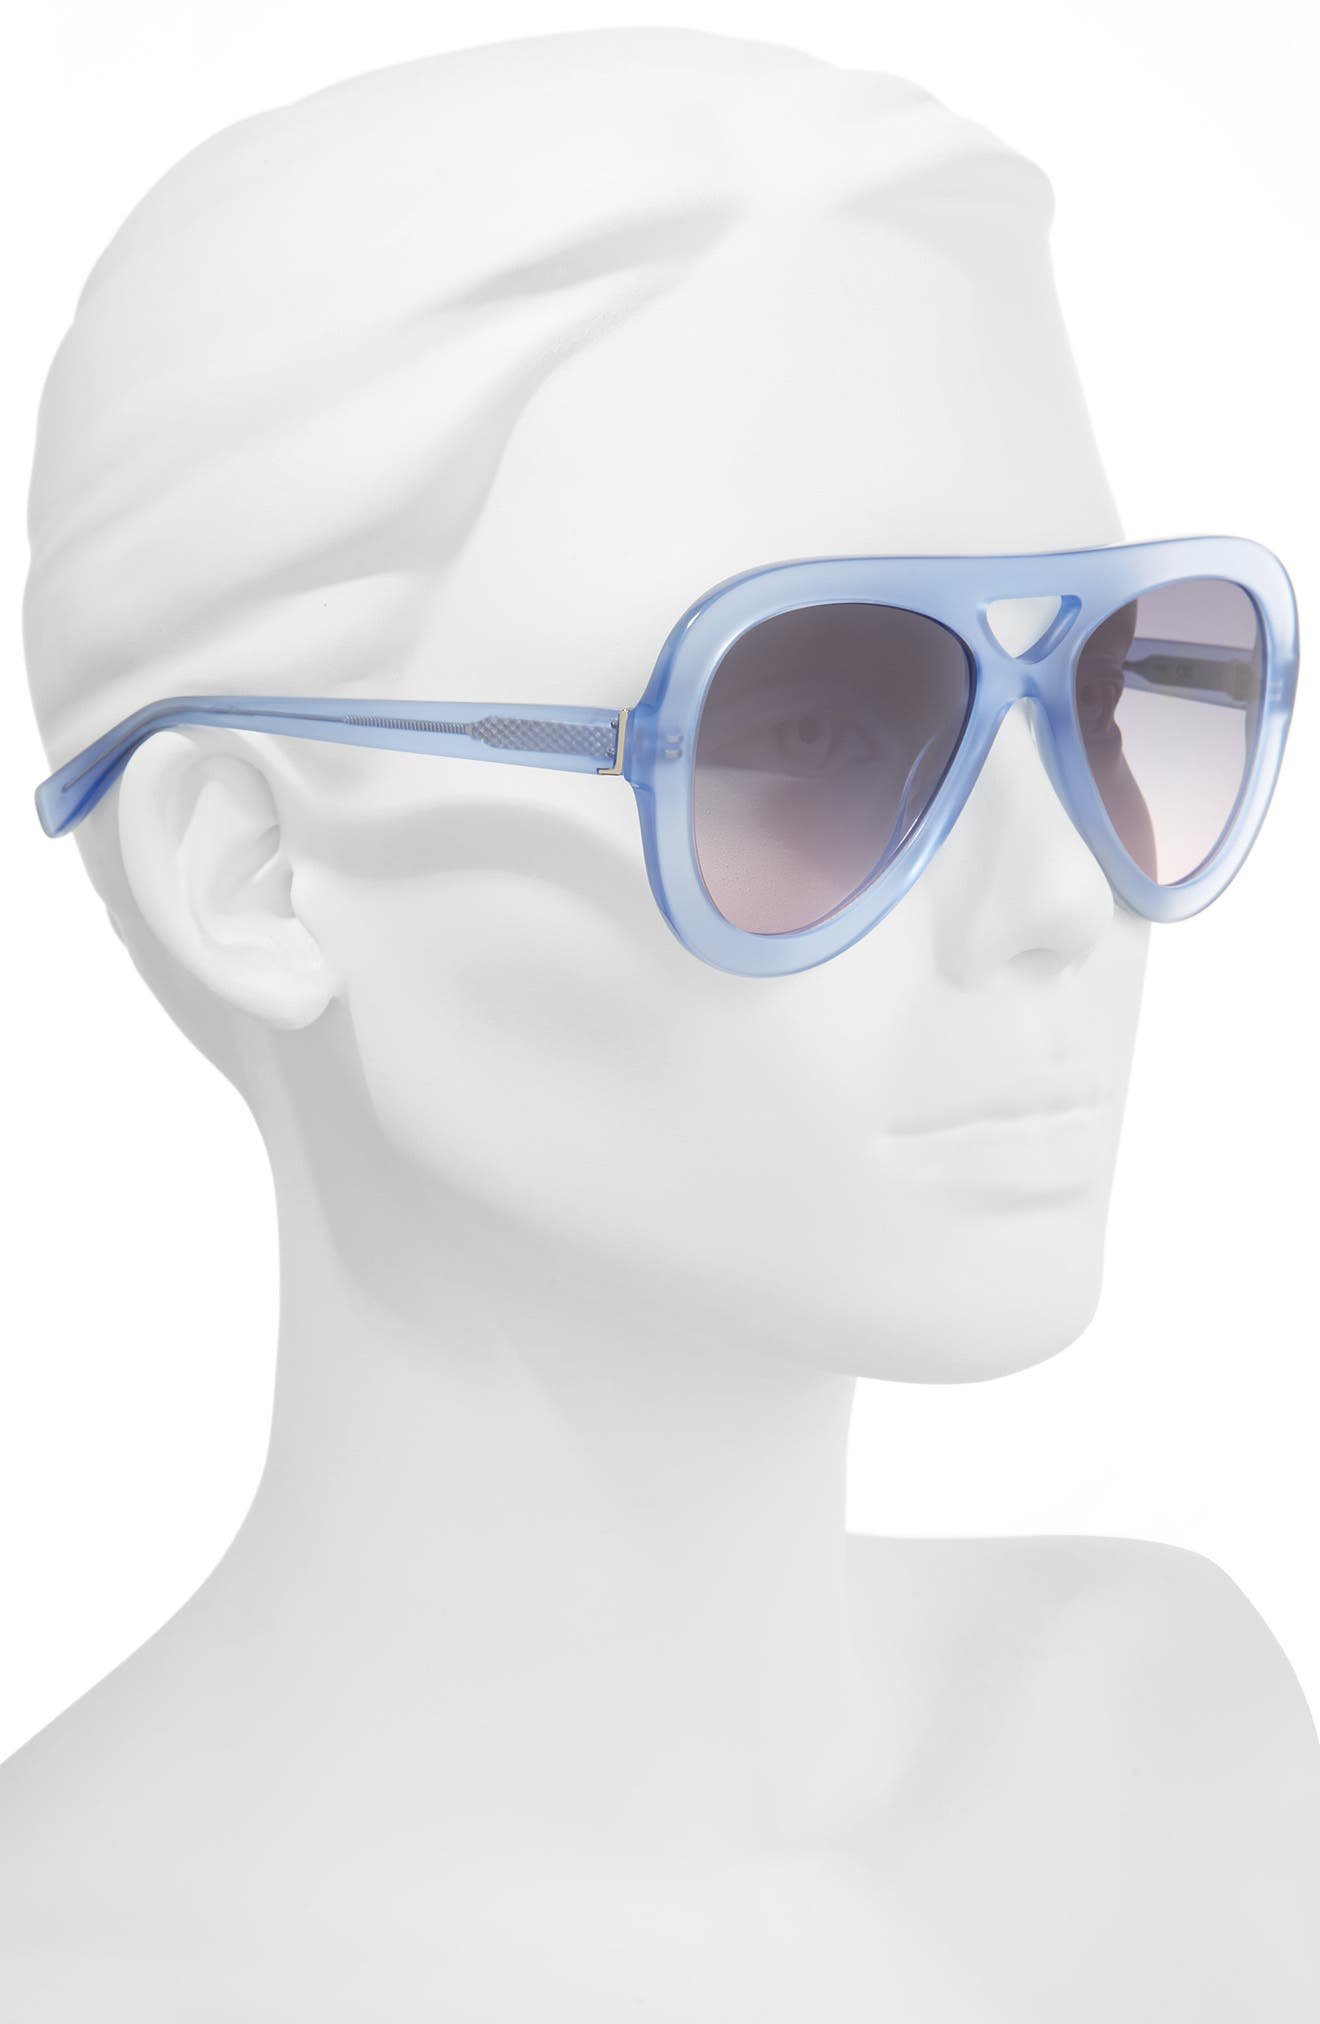 54mm Aviator Sunglasses,                             Alternate thumbnail 2, color,                             IRIS